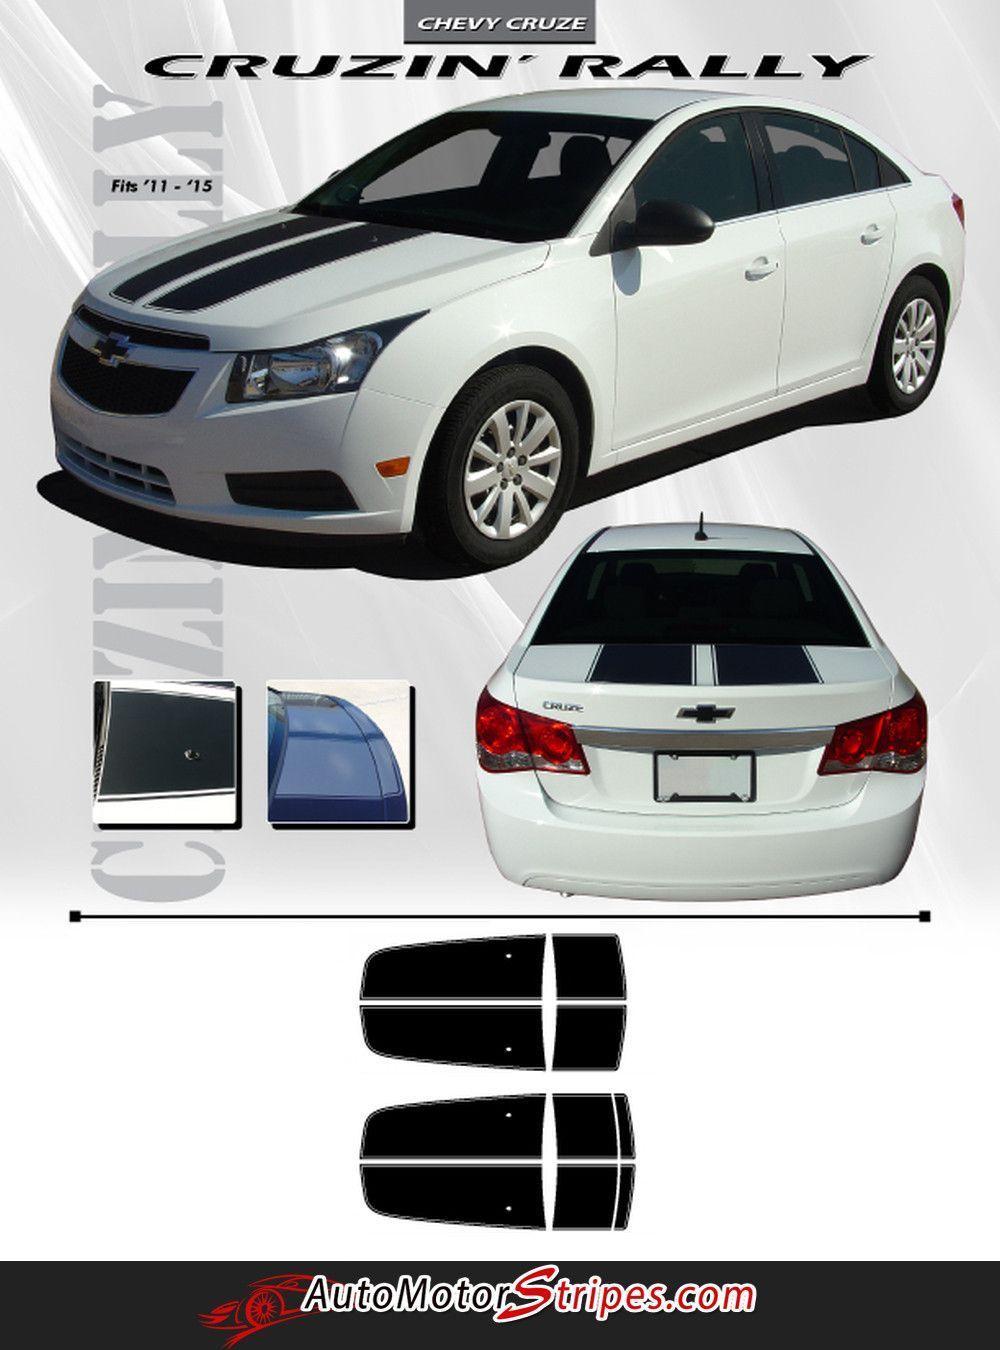 Hood Trunk Rally Racing 3M Pro Vinyl Stripe Graphic Decal 2011-2015 Chevy Cruze